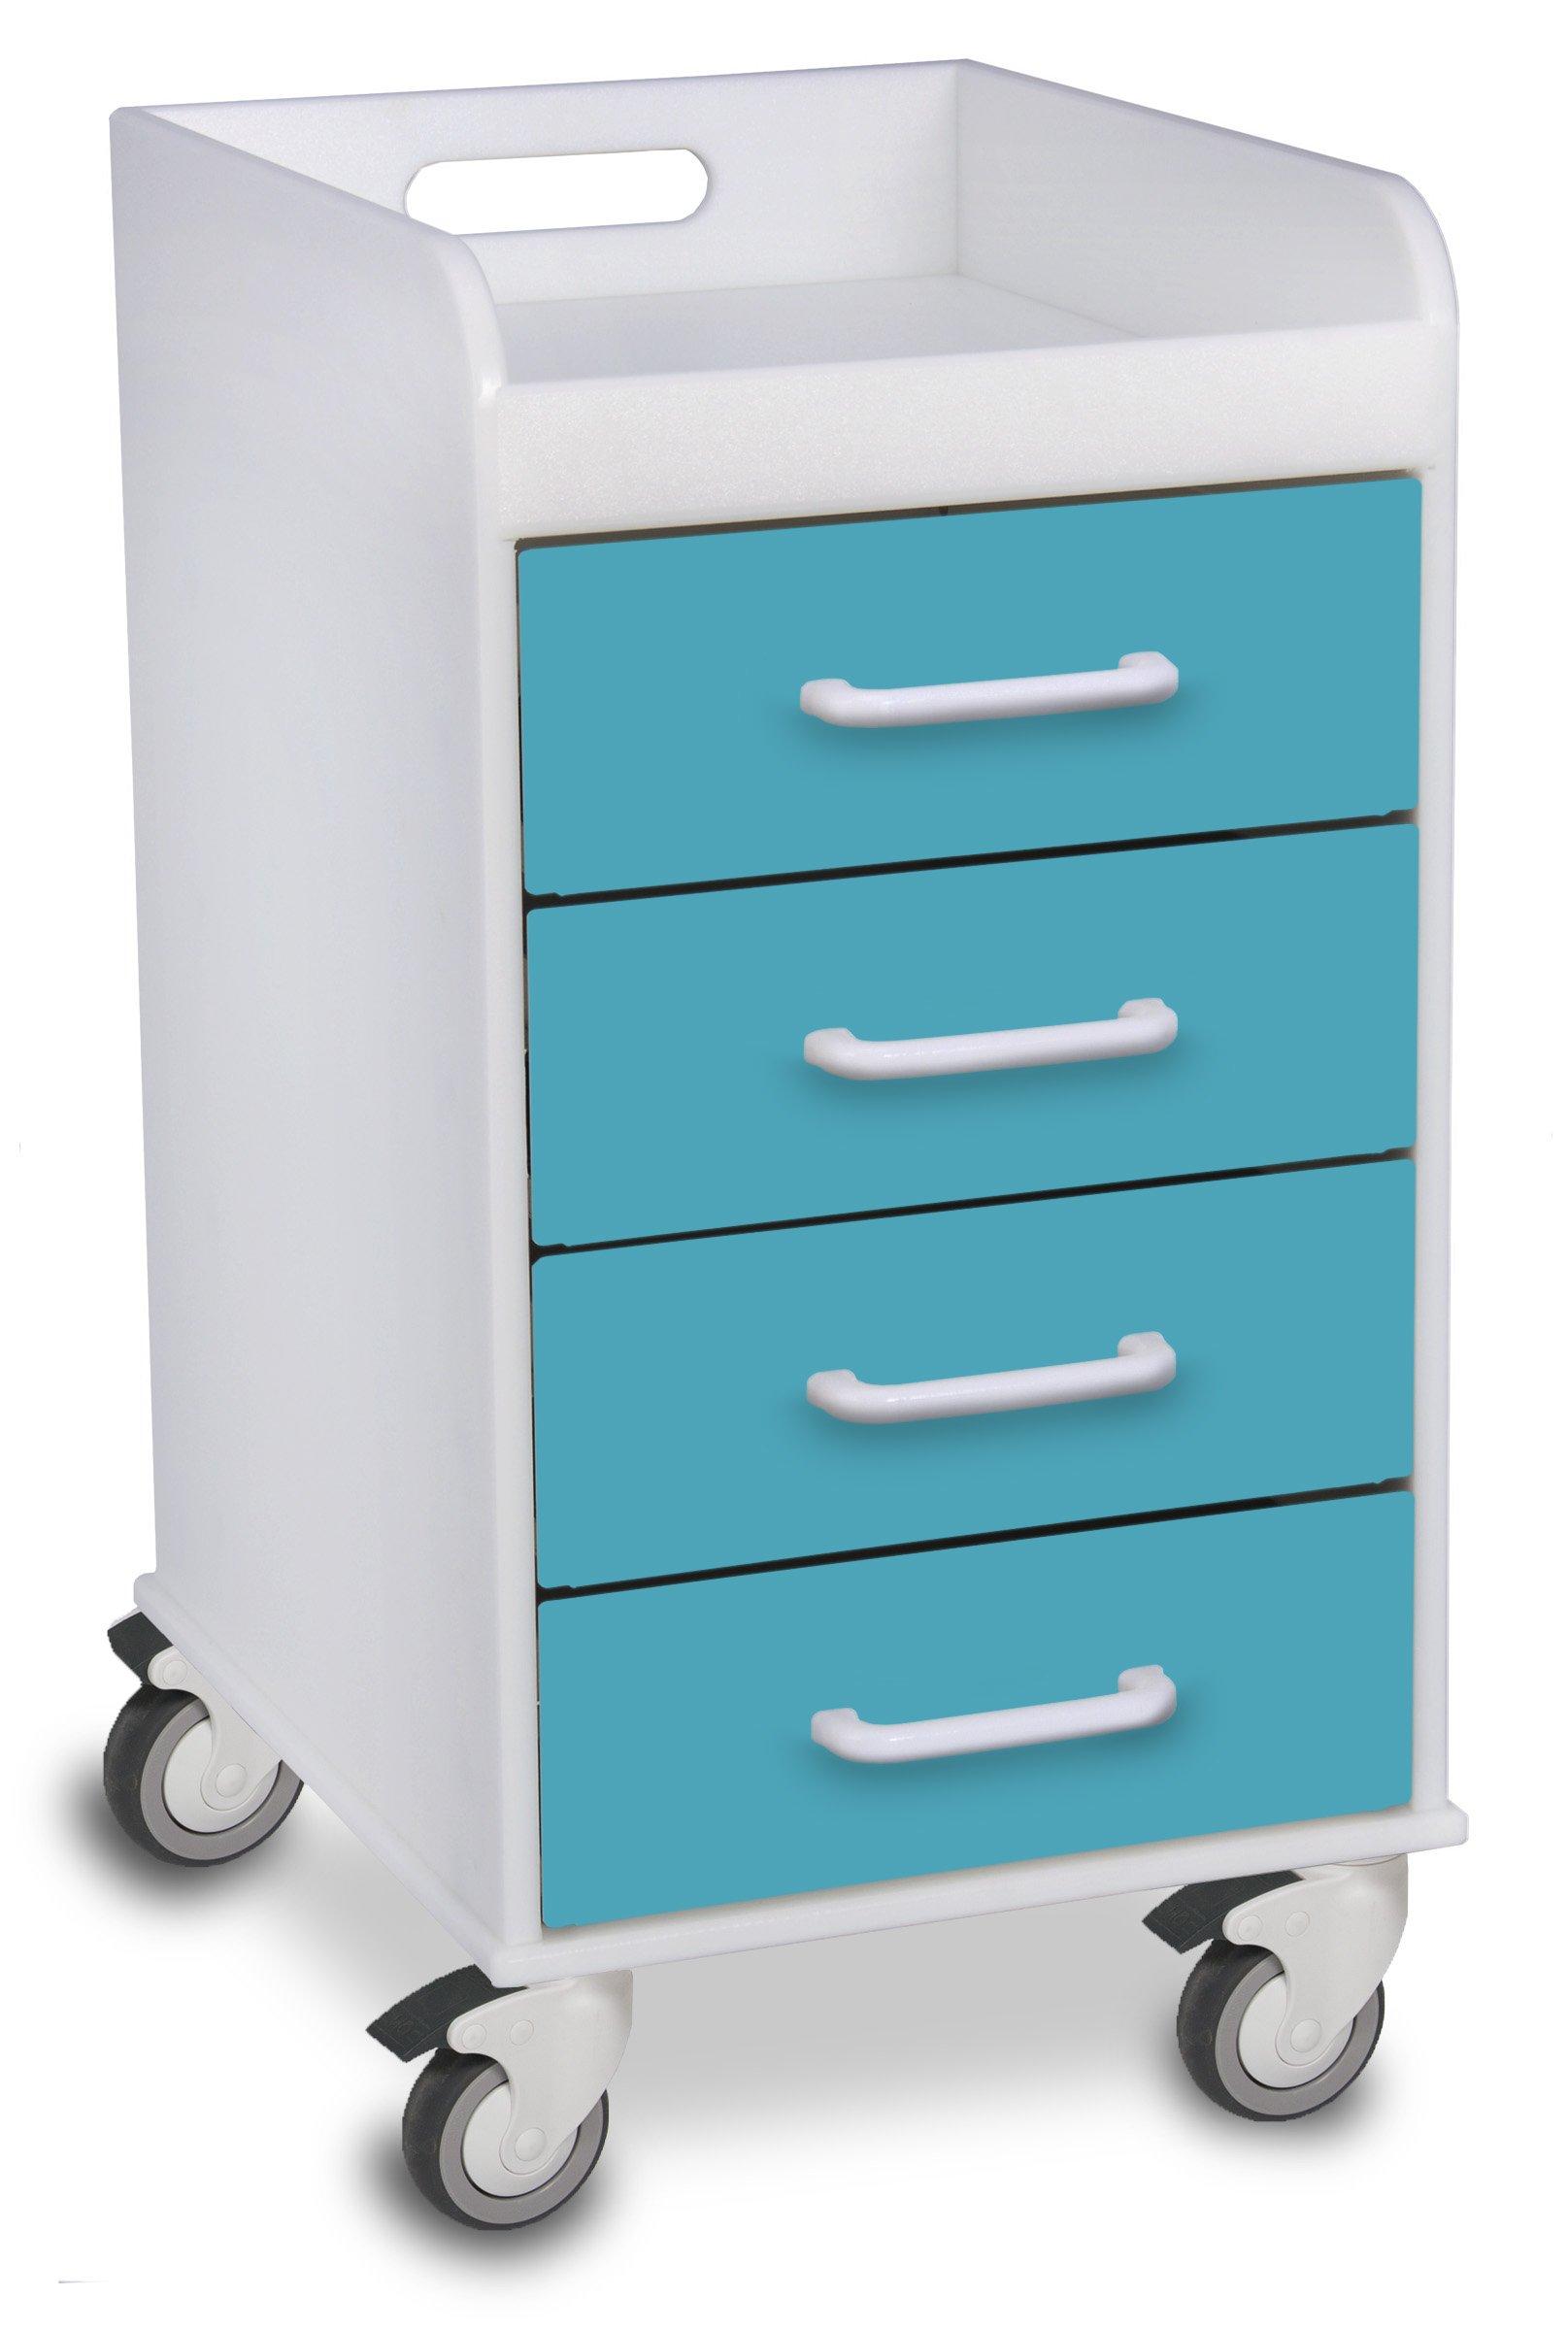 TrippNT 51086 Polyethylene Compact Locking Cart, 14'' Width x 27'' Height x 19'' Depth, 4 Drawers, Bahamas Sea